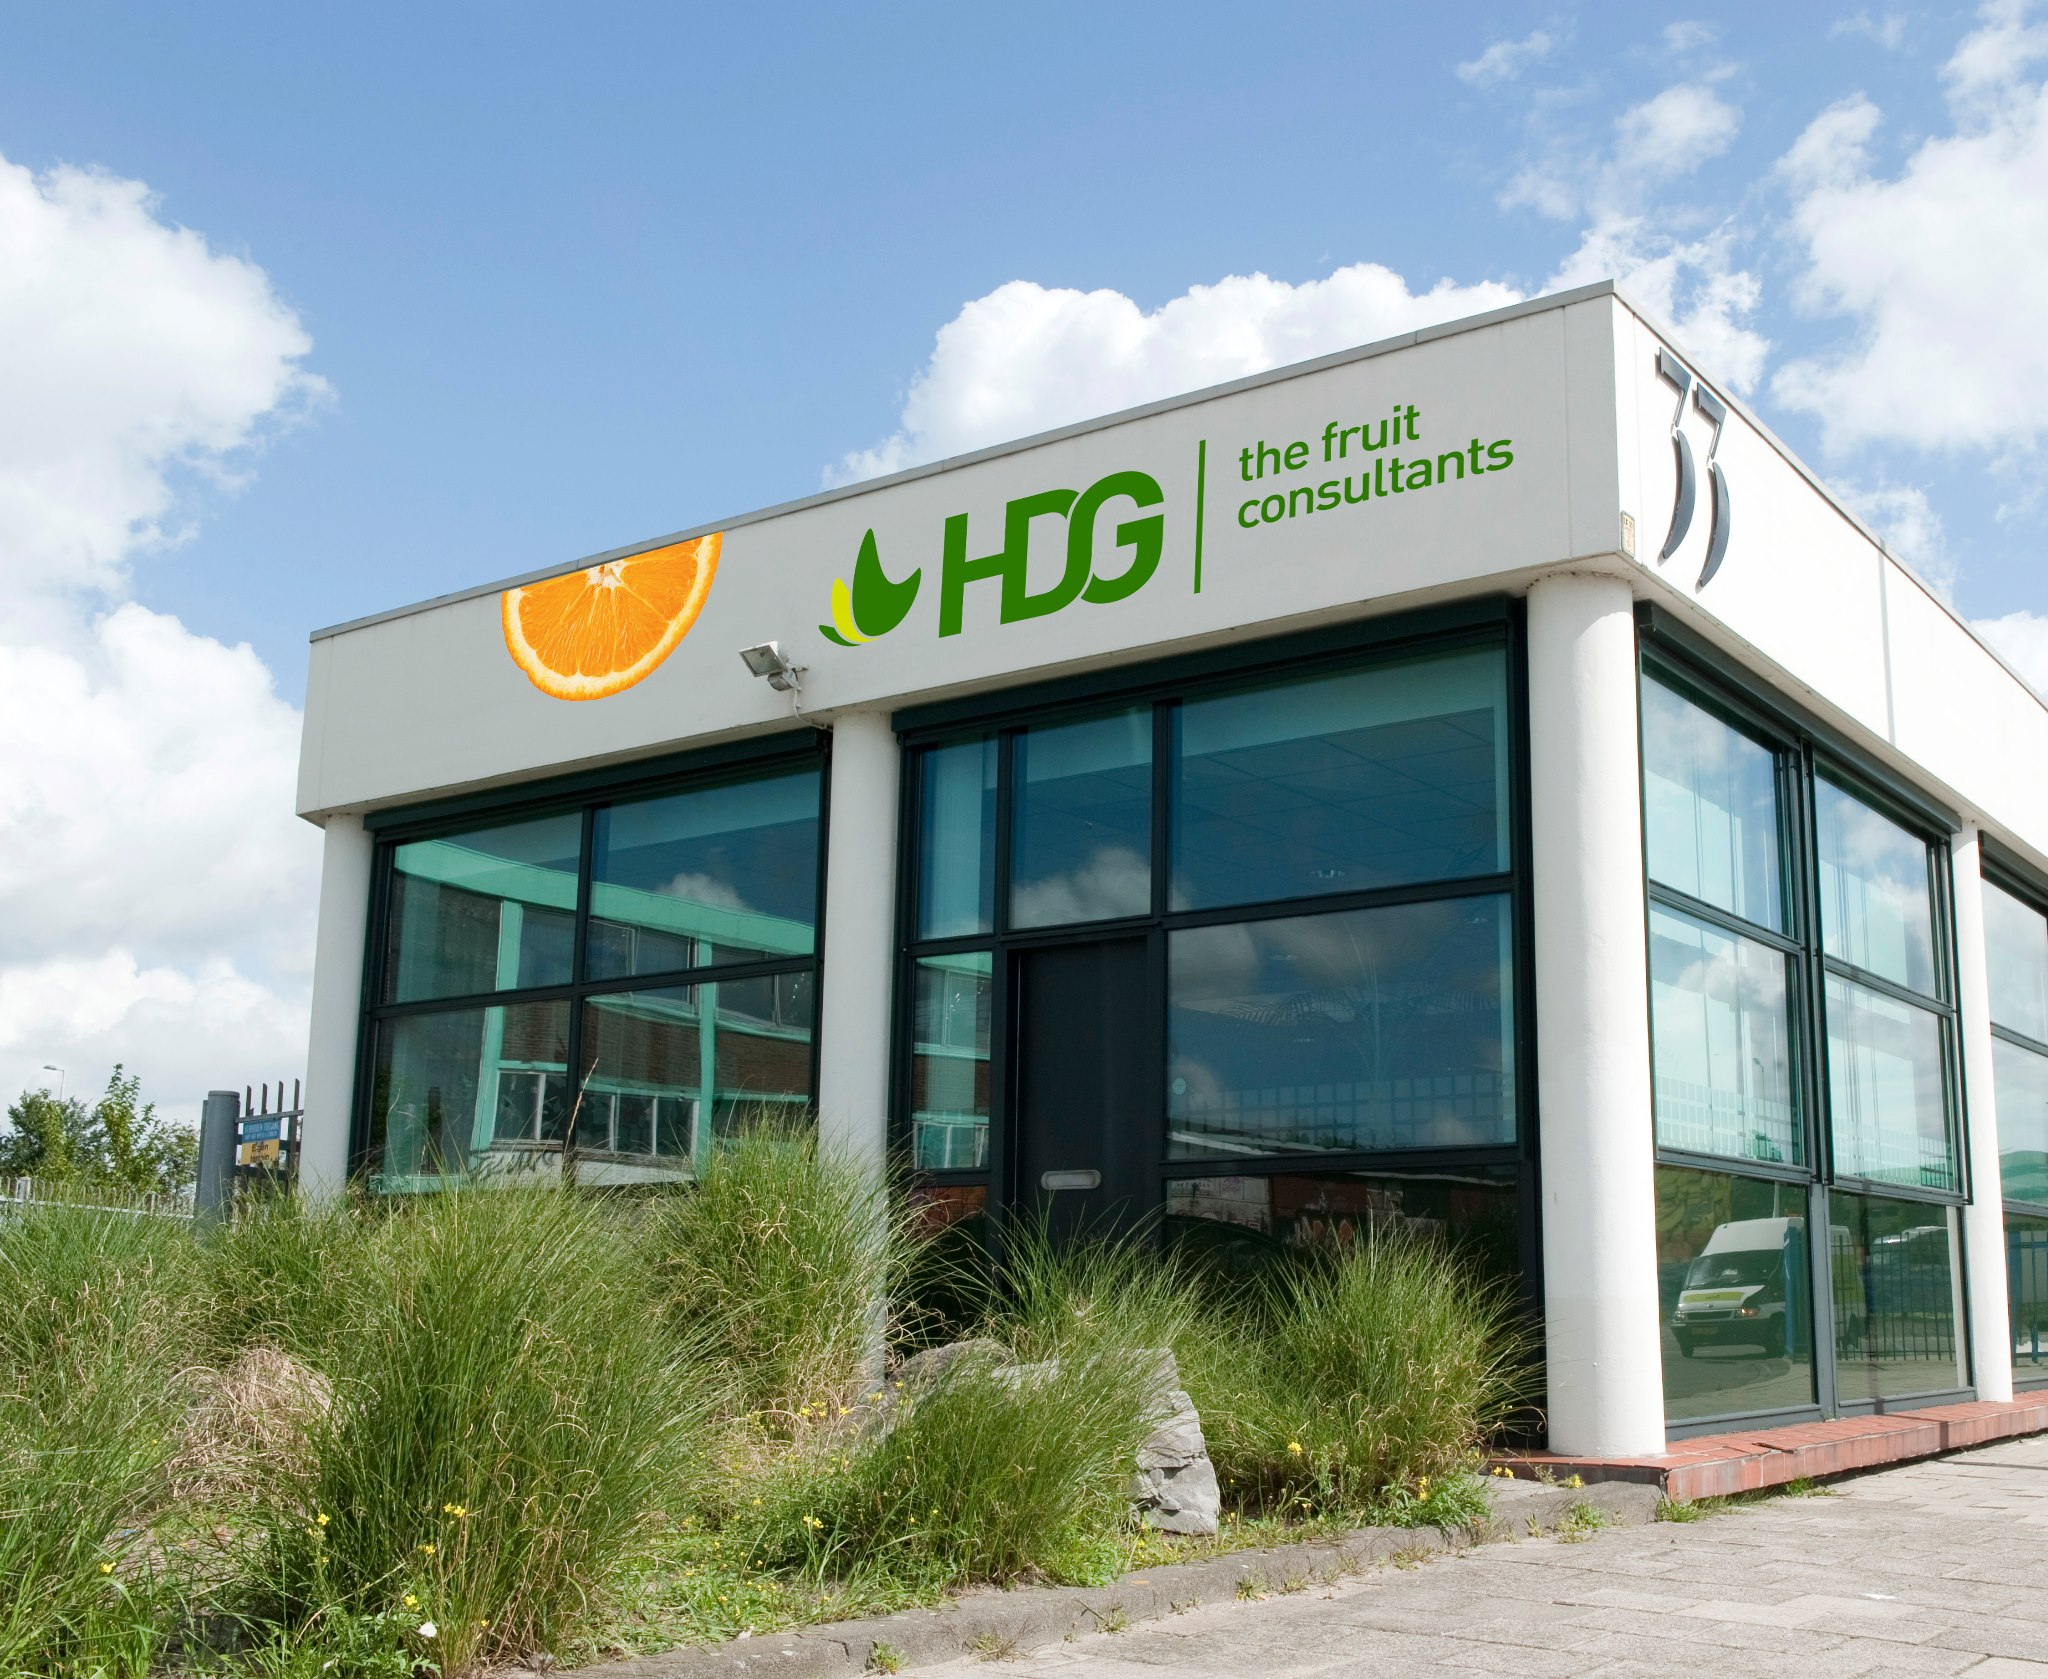 HDG the fruit consultants wedstrijdsponsor XerxesDZB - VV Brielle